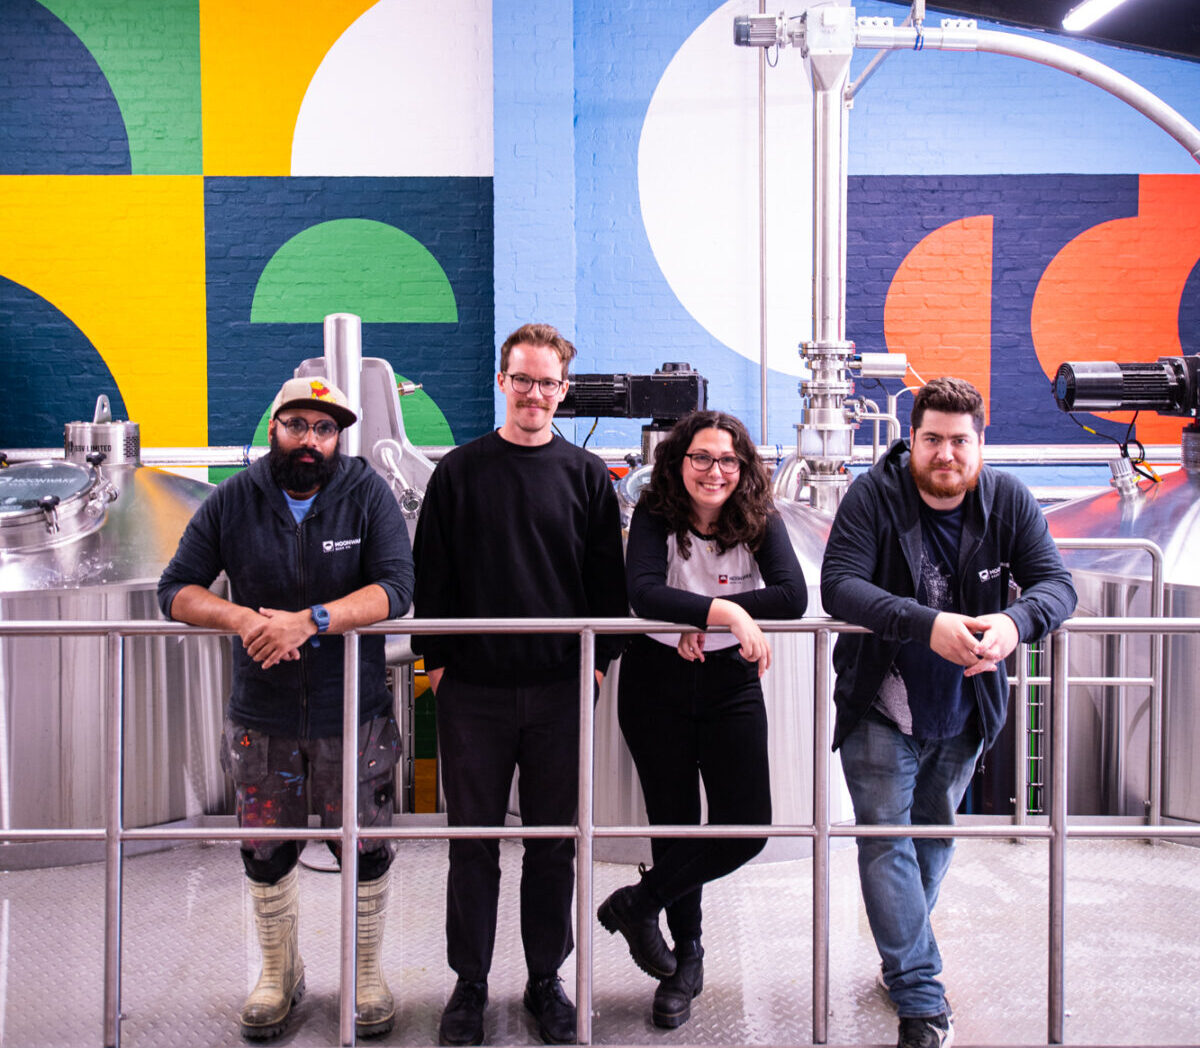 Moonwake Team - Craft Beer Brewery Leith Edinburgh